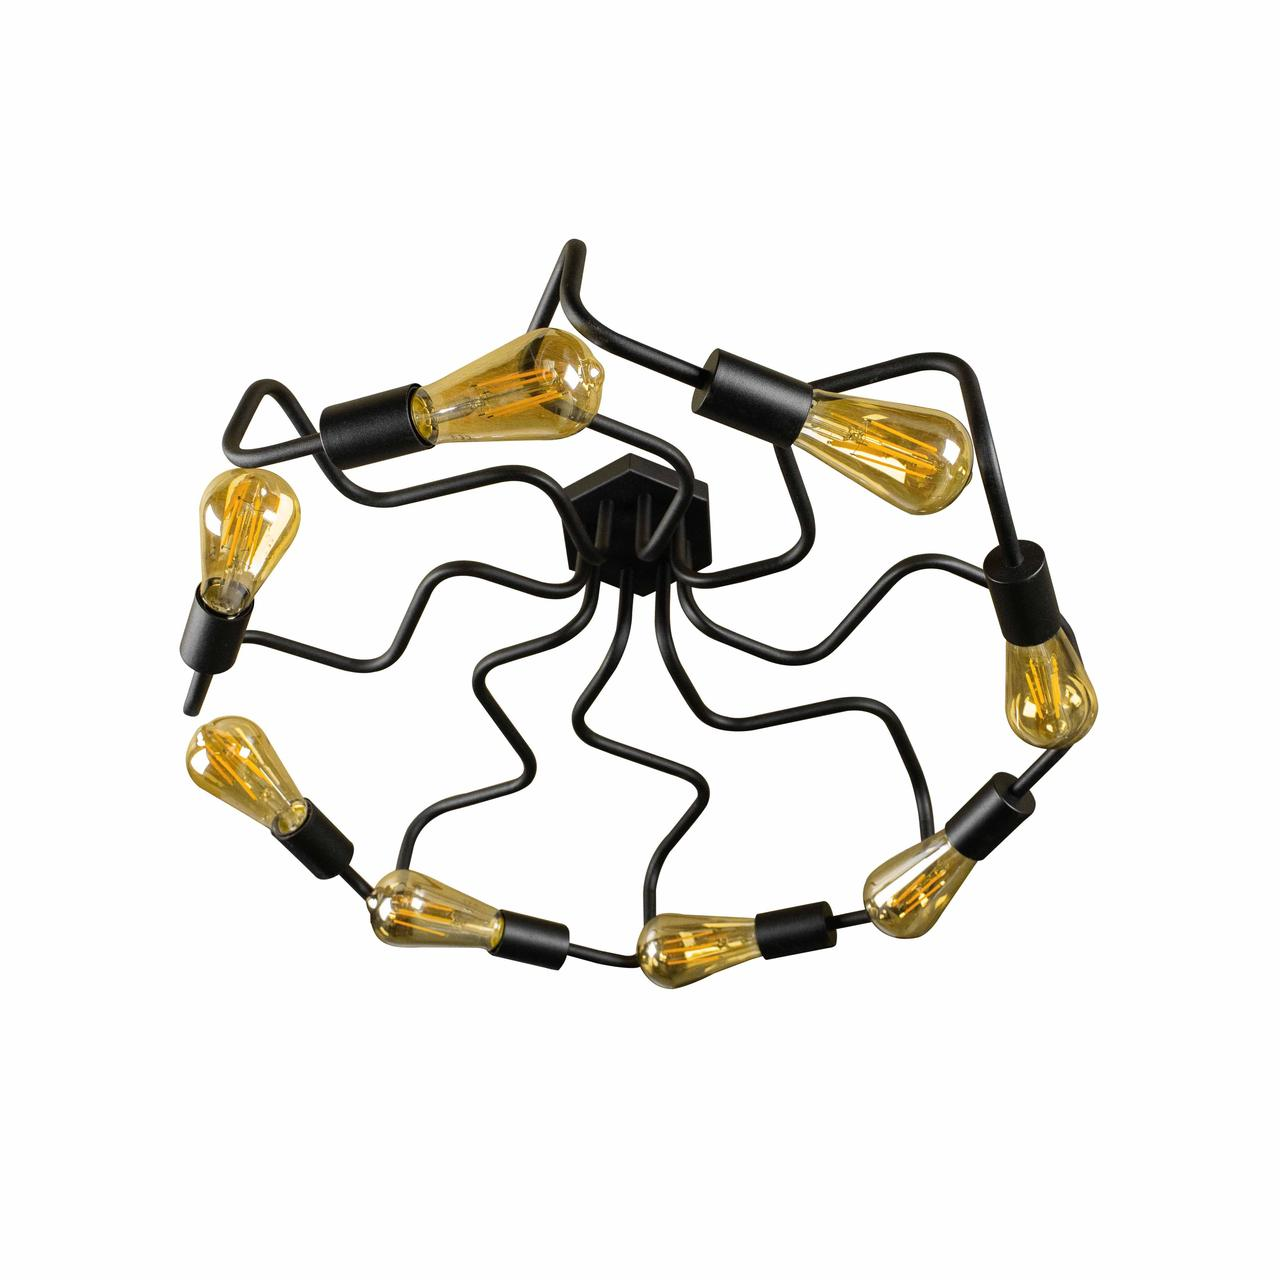 Люстра лофт на восемь ламп паук NL5526-8  MSK Electric